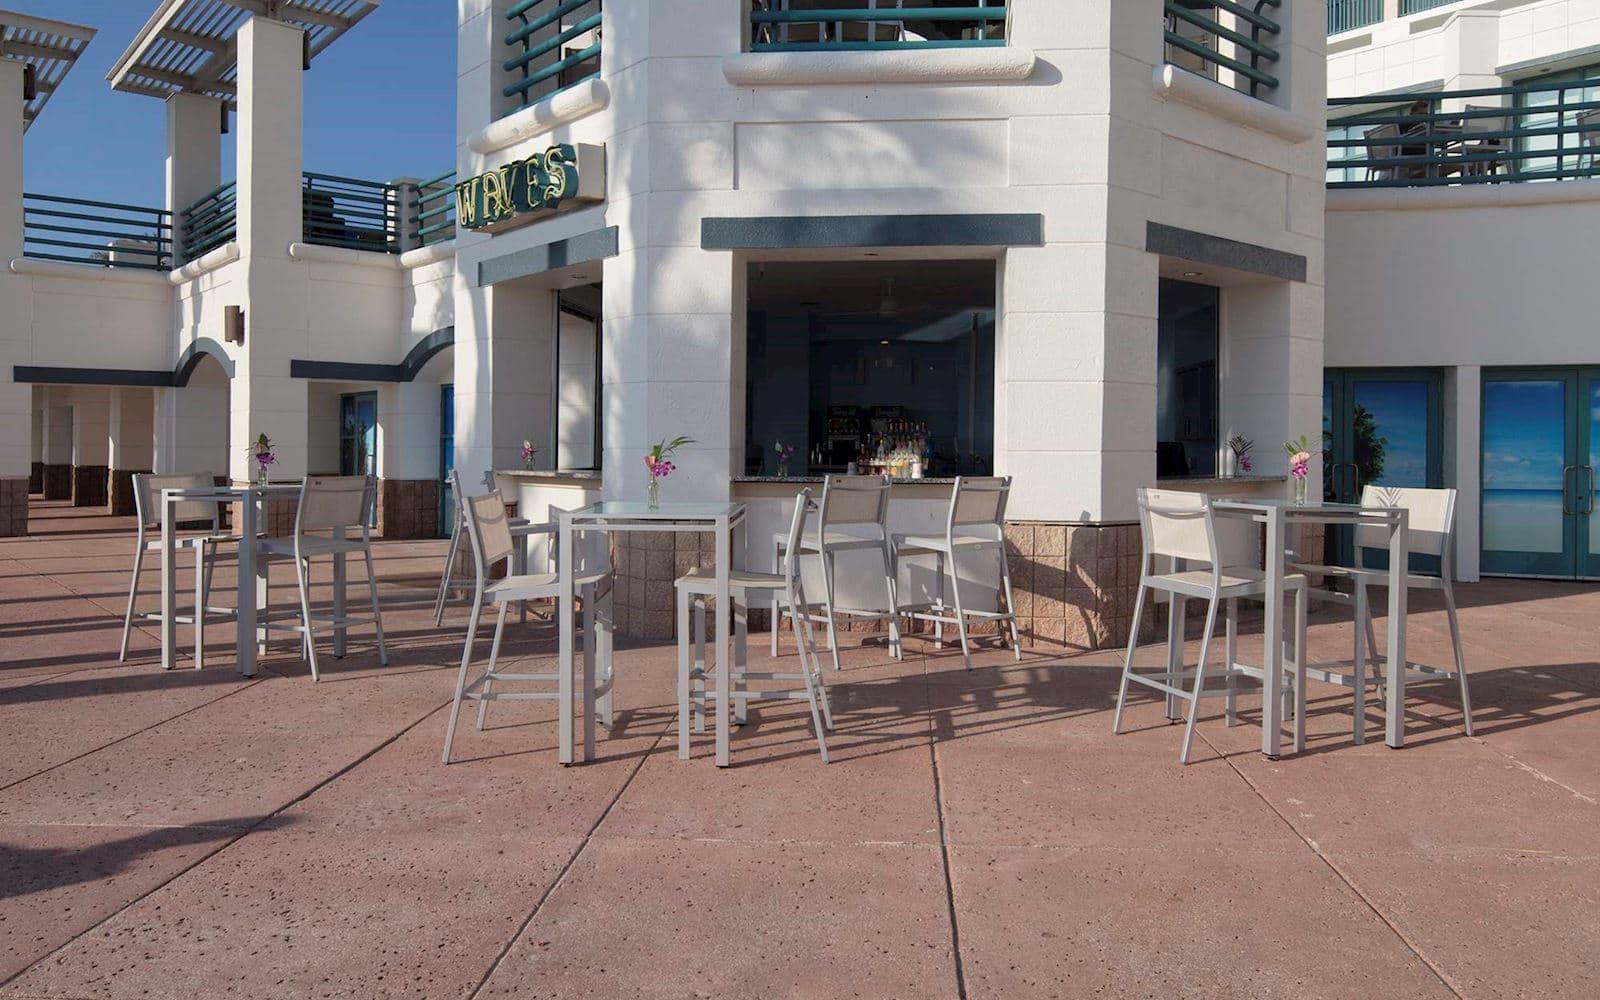 Daytona Beach Waves Beach Bar